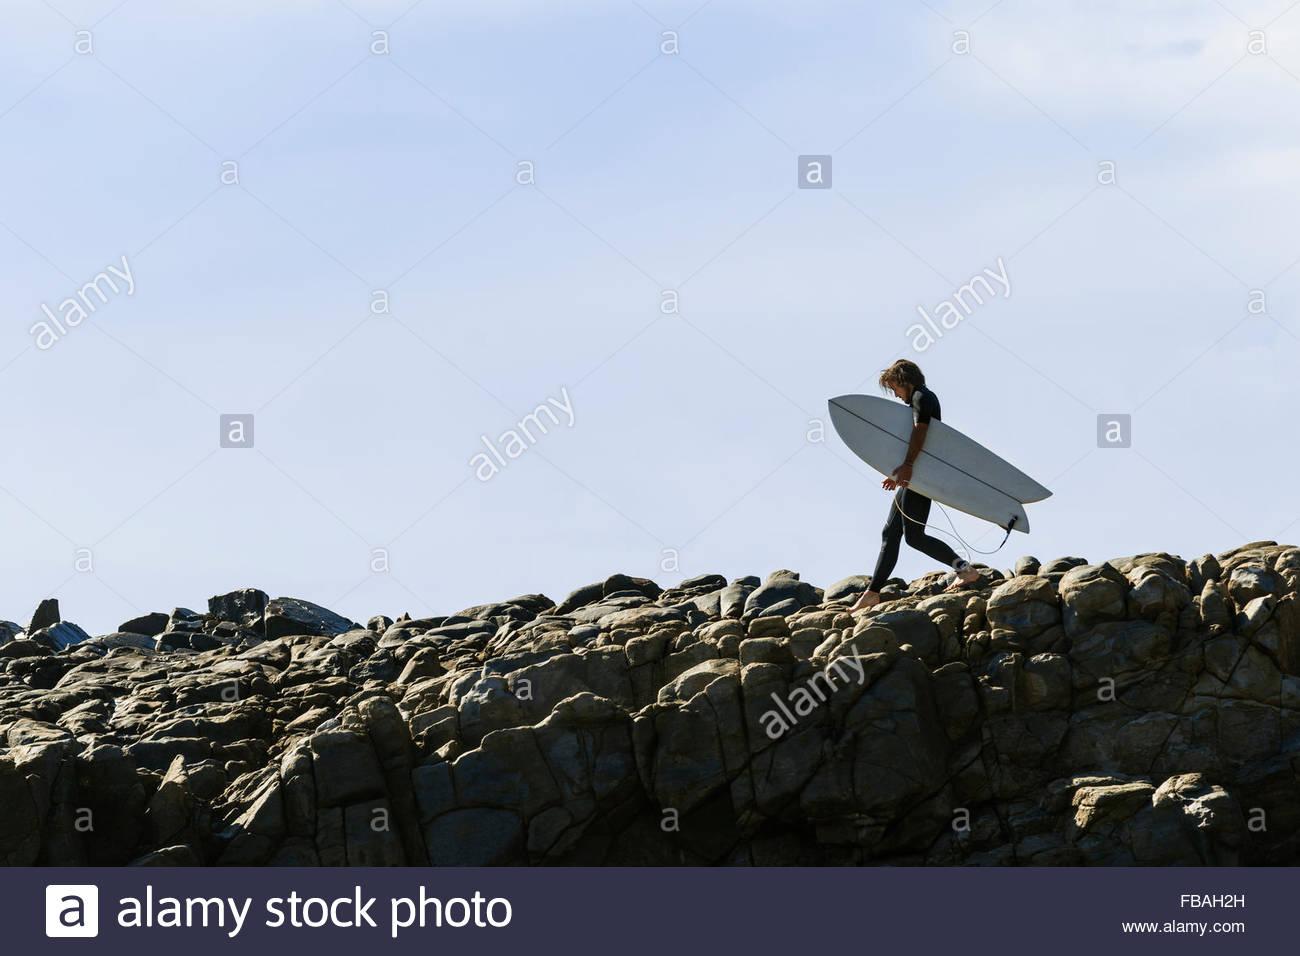 Australien, Queensland, Sunshine Coast, Noosa, Alexandria Bay, Surfer mit Surfbrett Stockbild